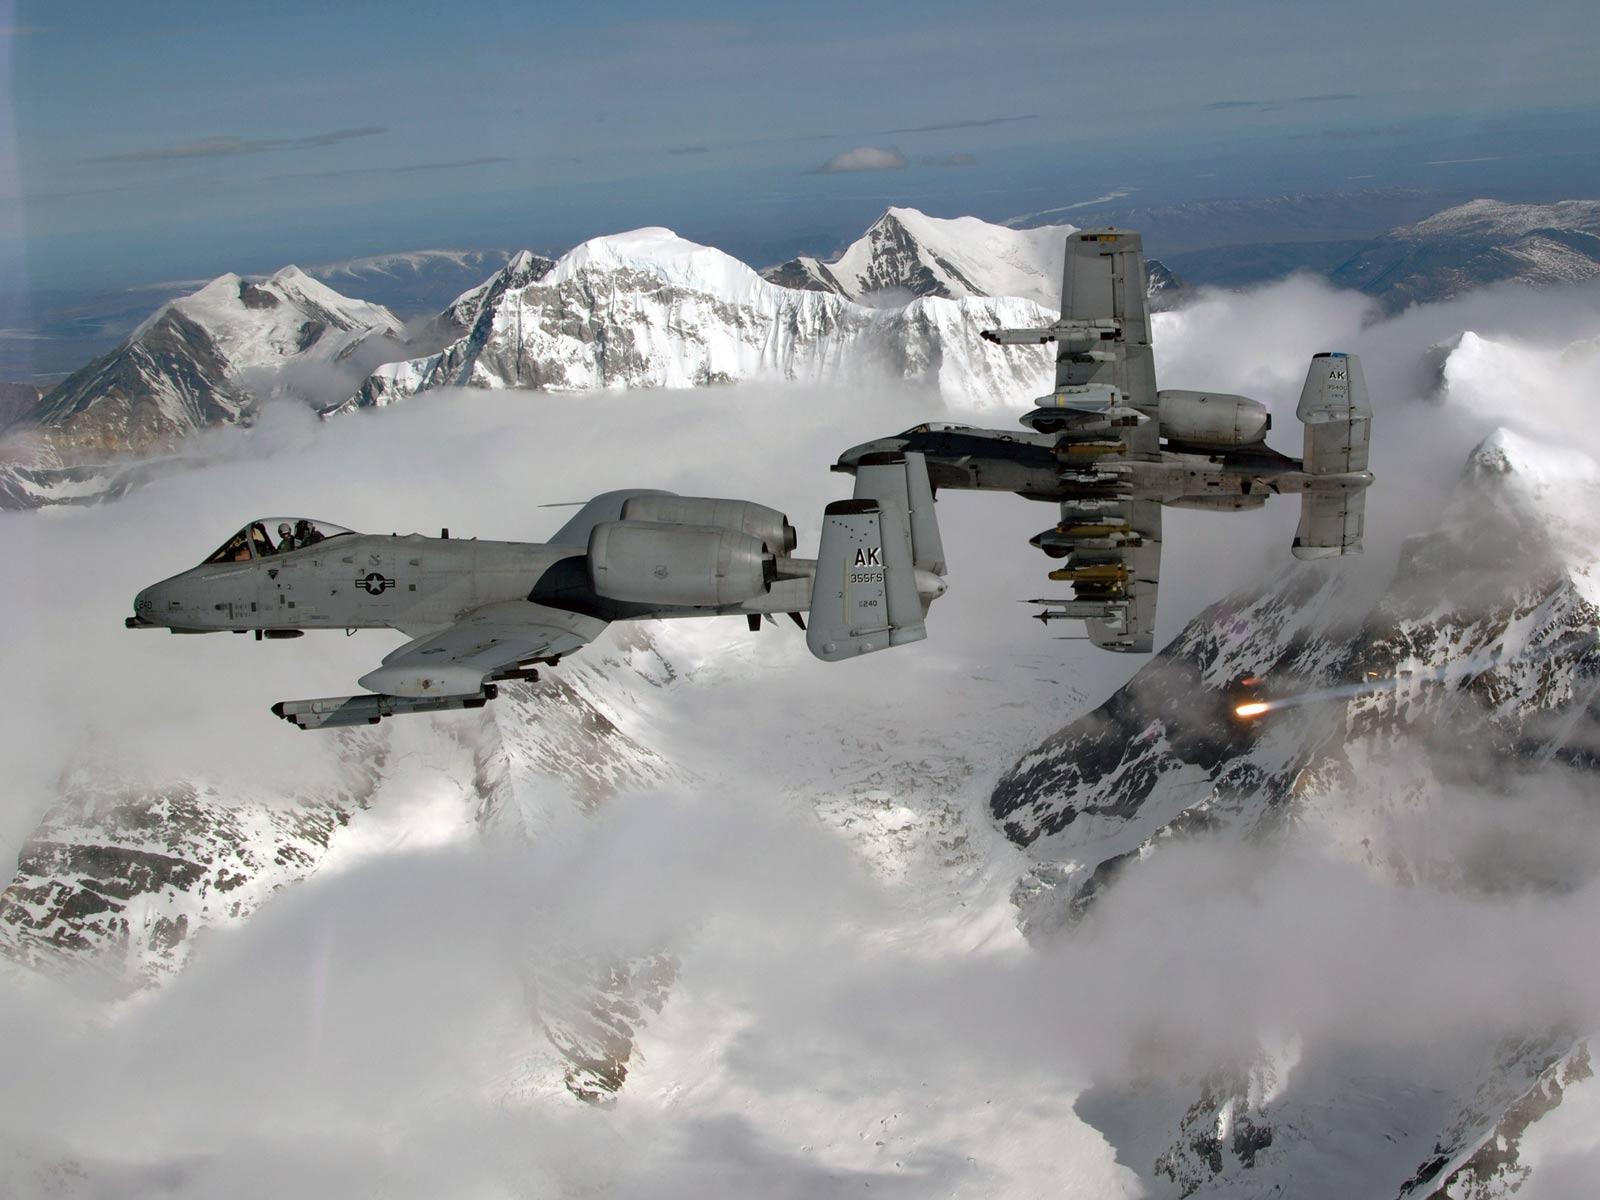 http://1.bp.blogspot.com/-2CbUQiMyE0Q/TeXSFdeb2GI/AAAAAAAABEk/MuWid_fDWno/s1600/A_10A_-_Military_Aircraft.jpg